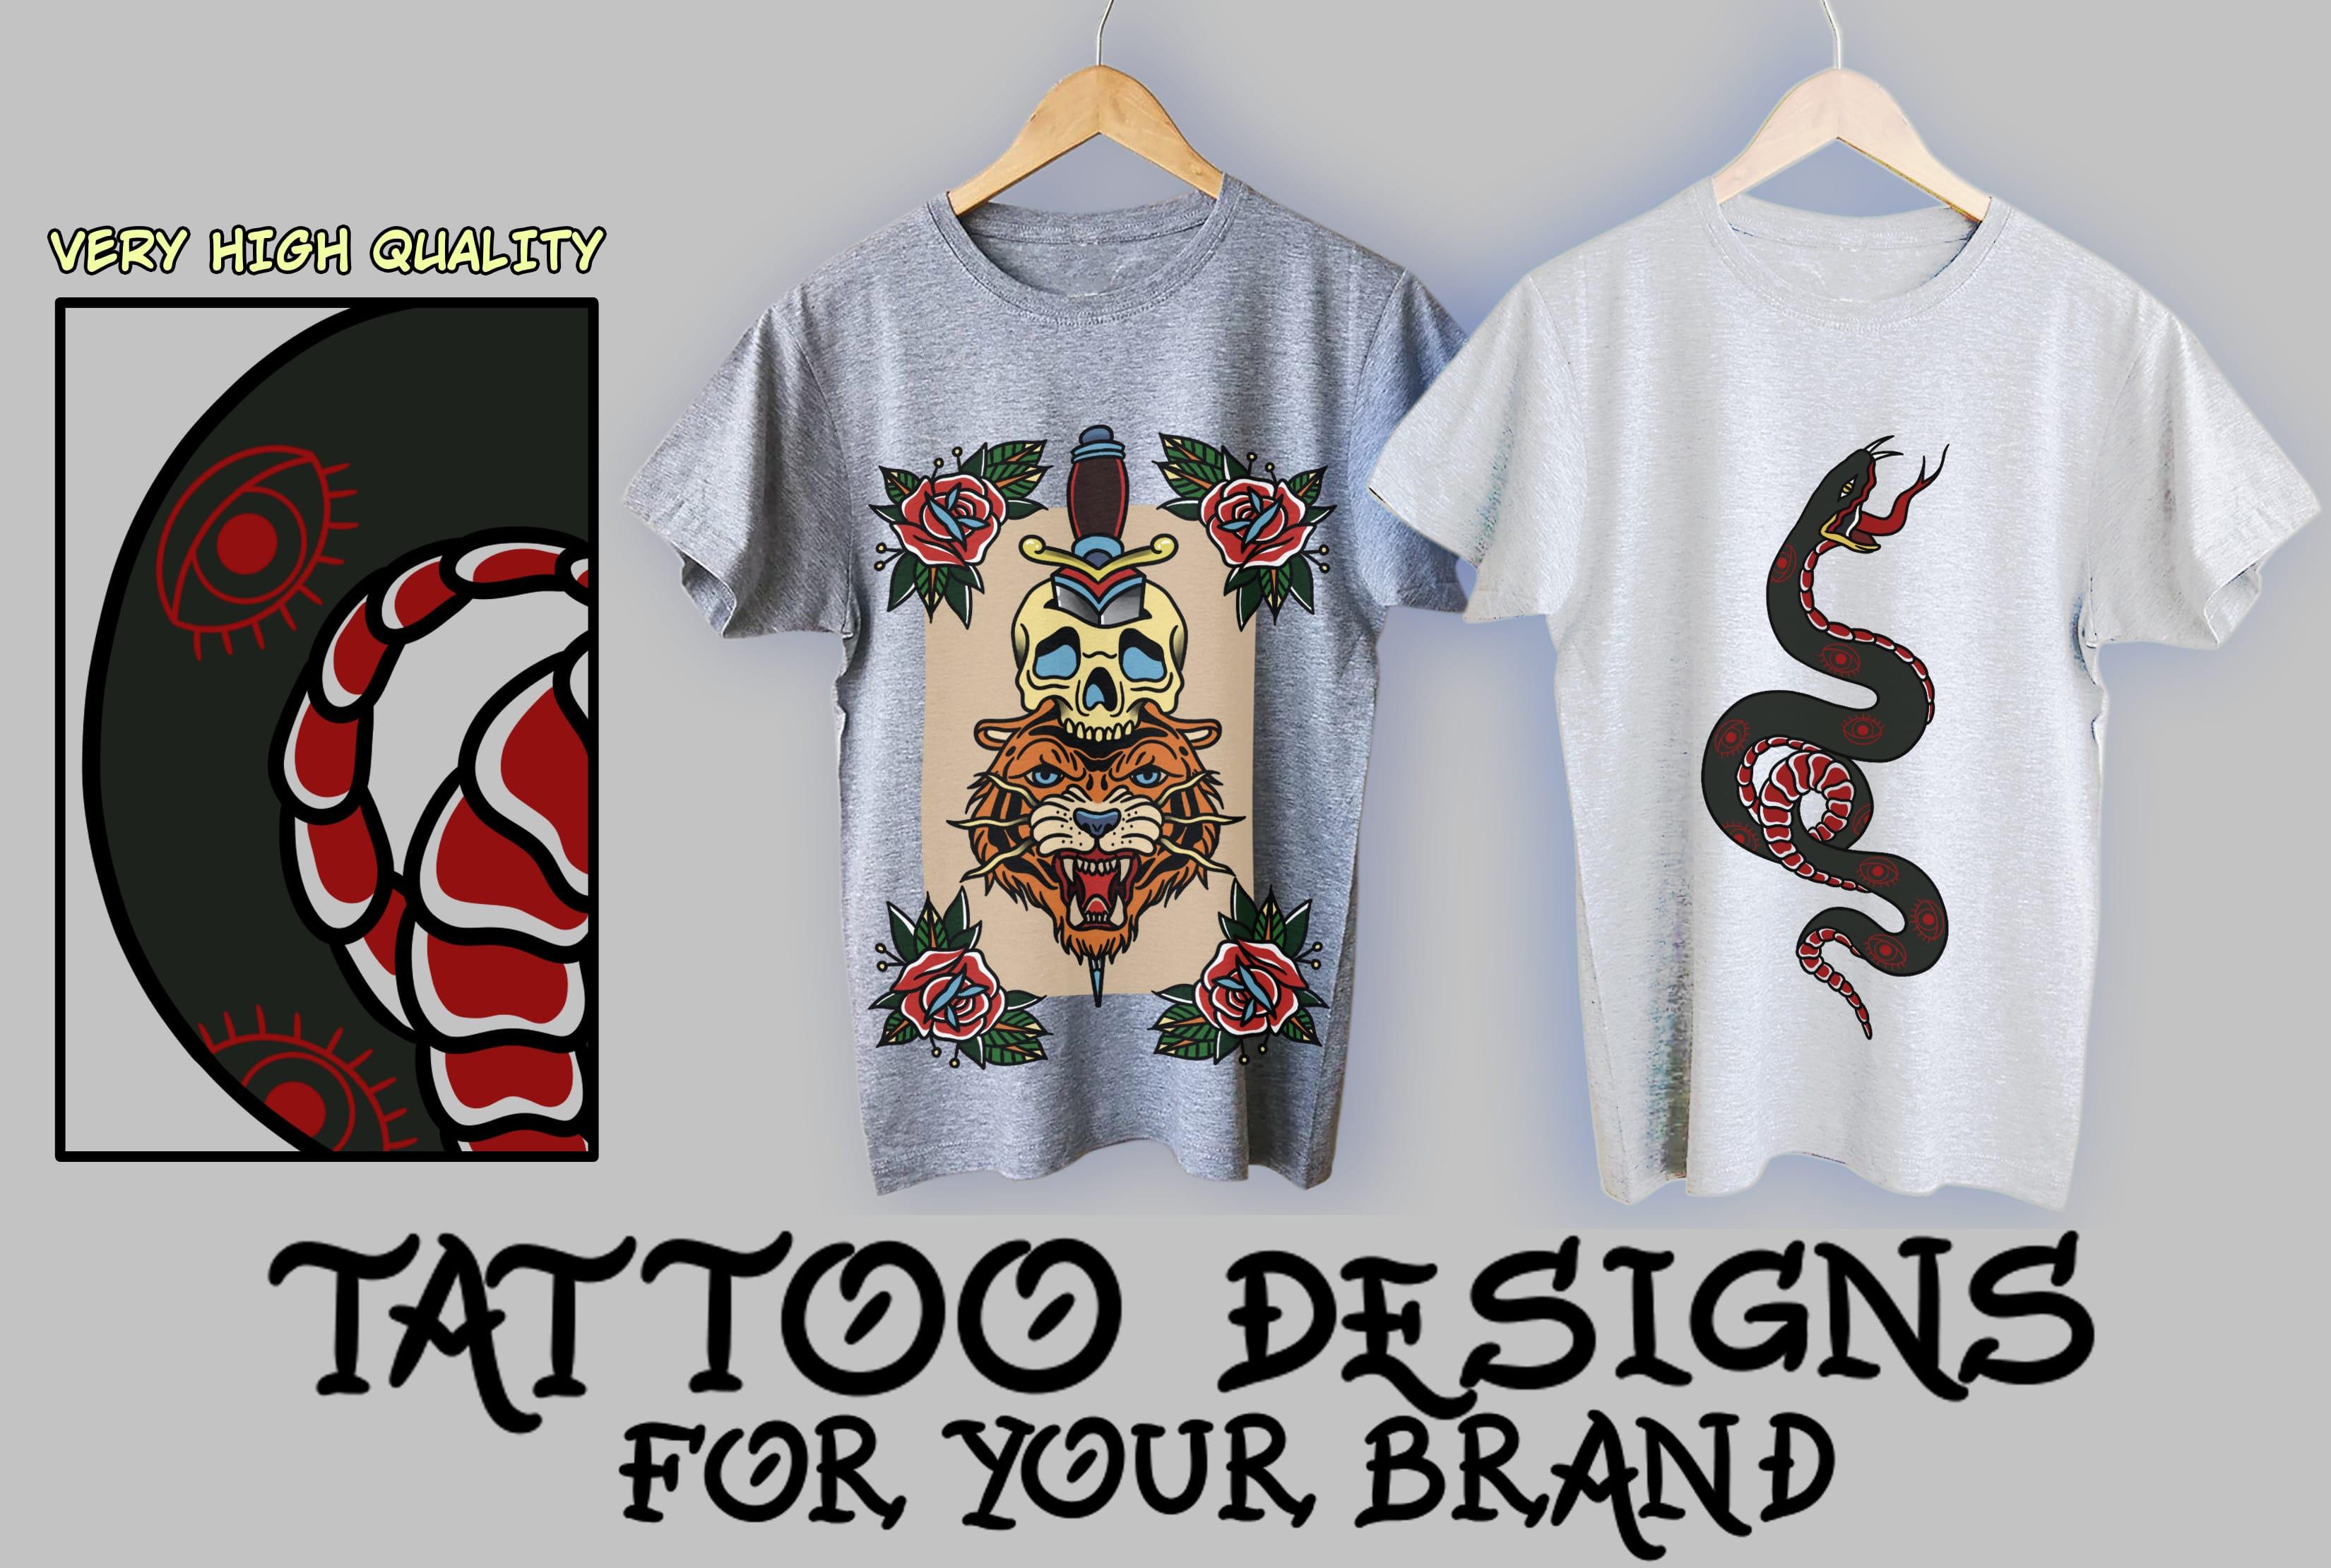 Create a cool custom t shirt design tattoo inspired by Freyess | Fiverr